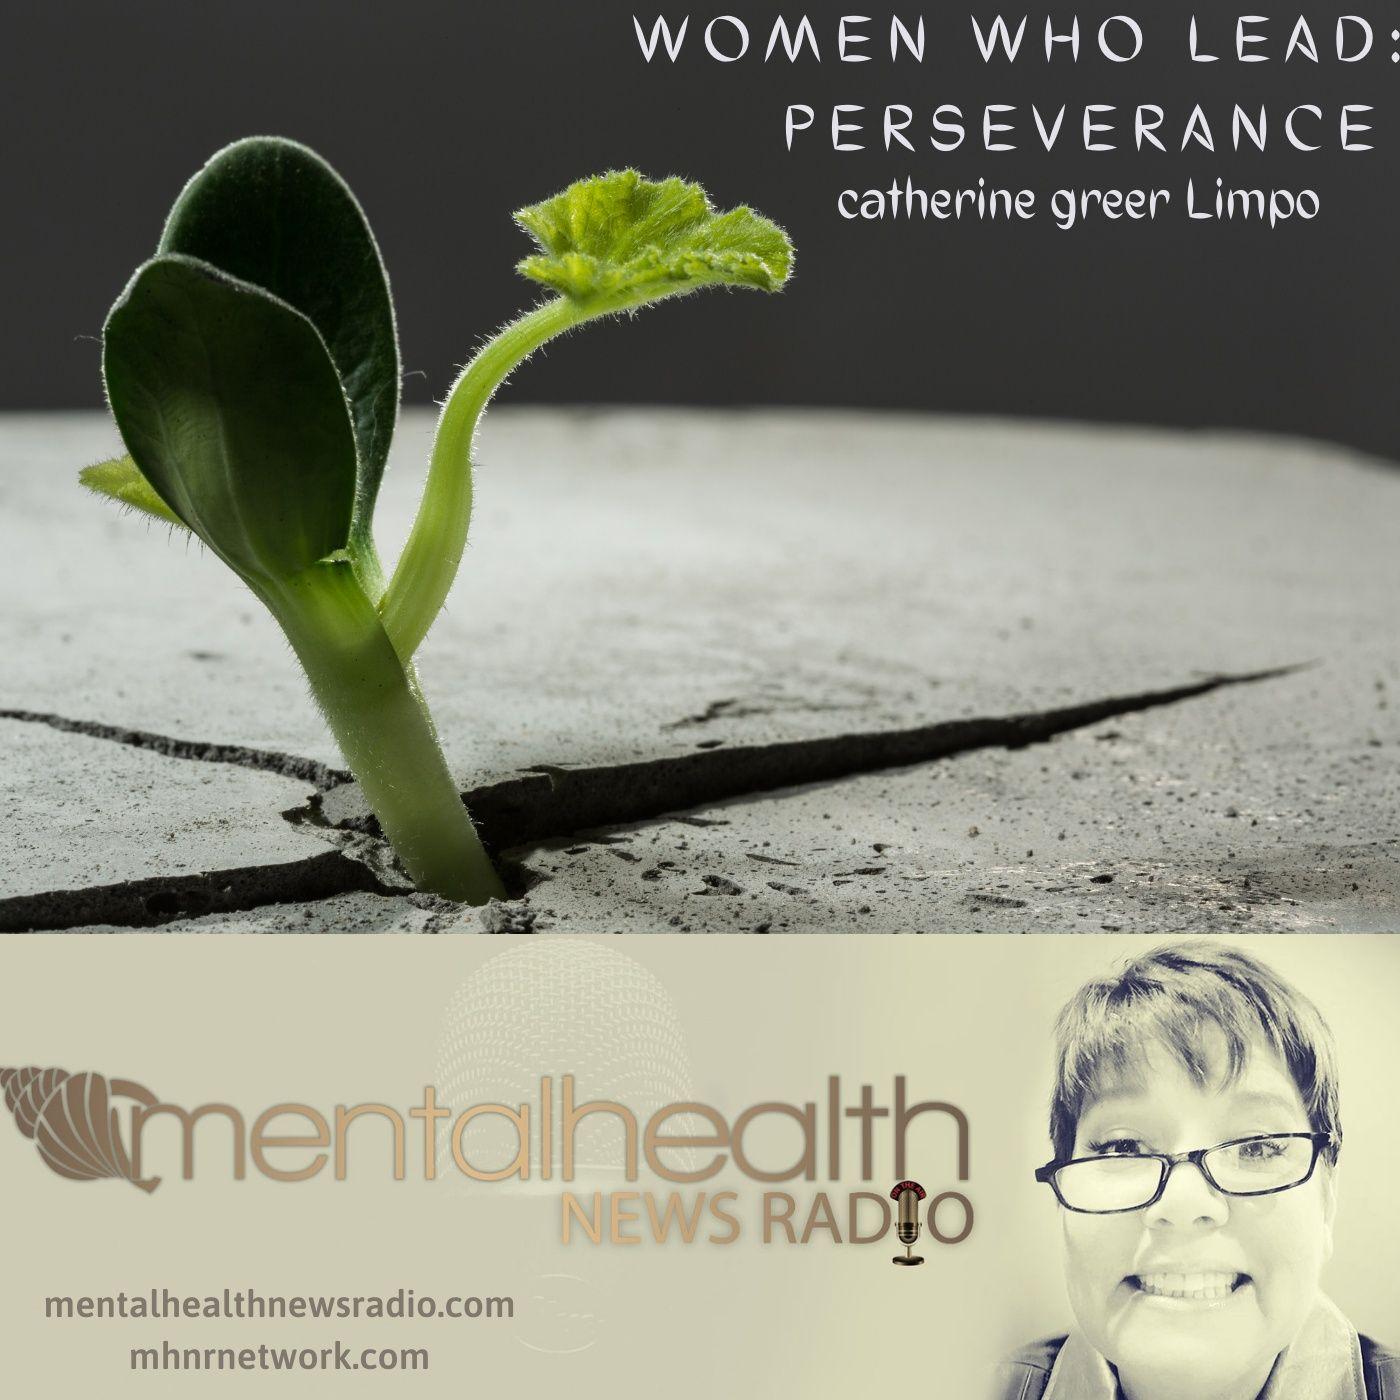 Mental Health News Radio - Women Who Lead: Perseverance